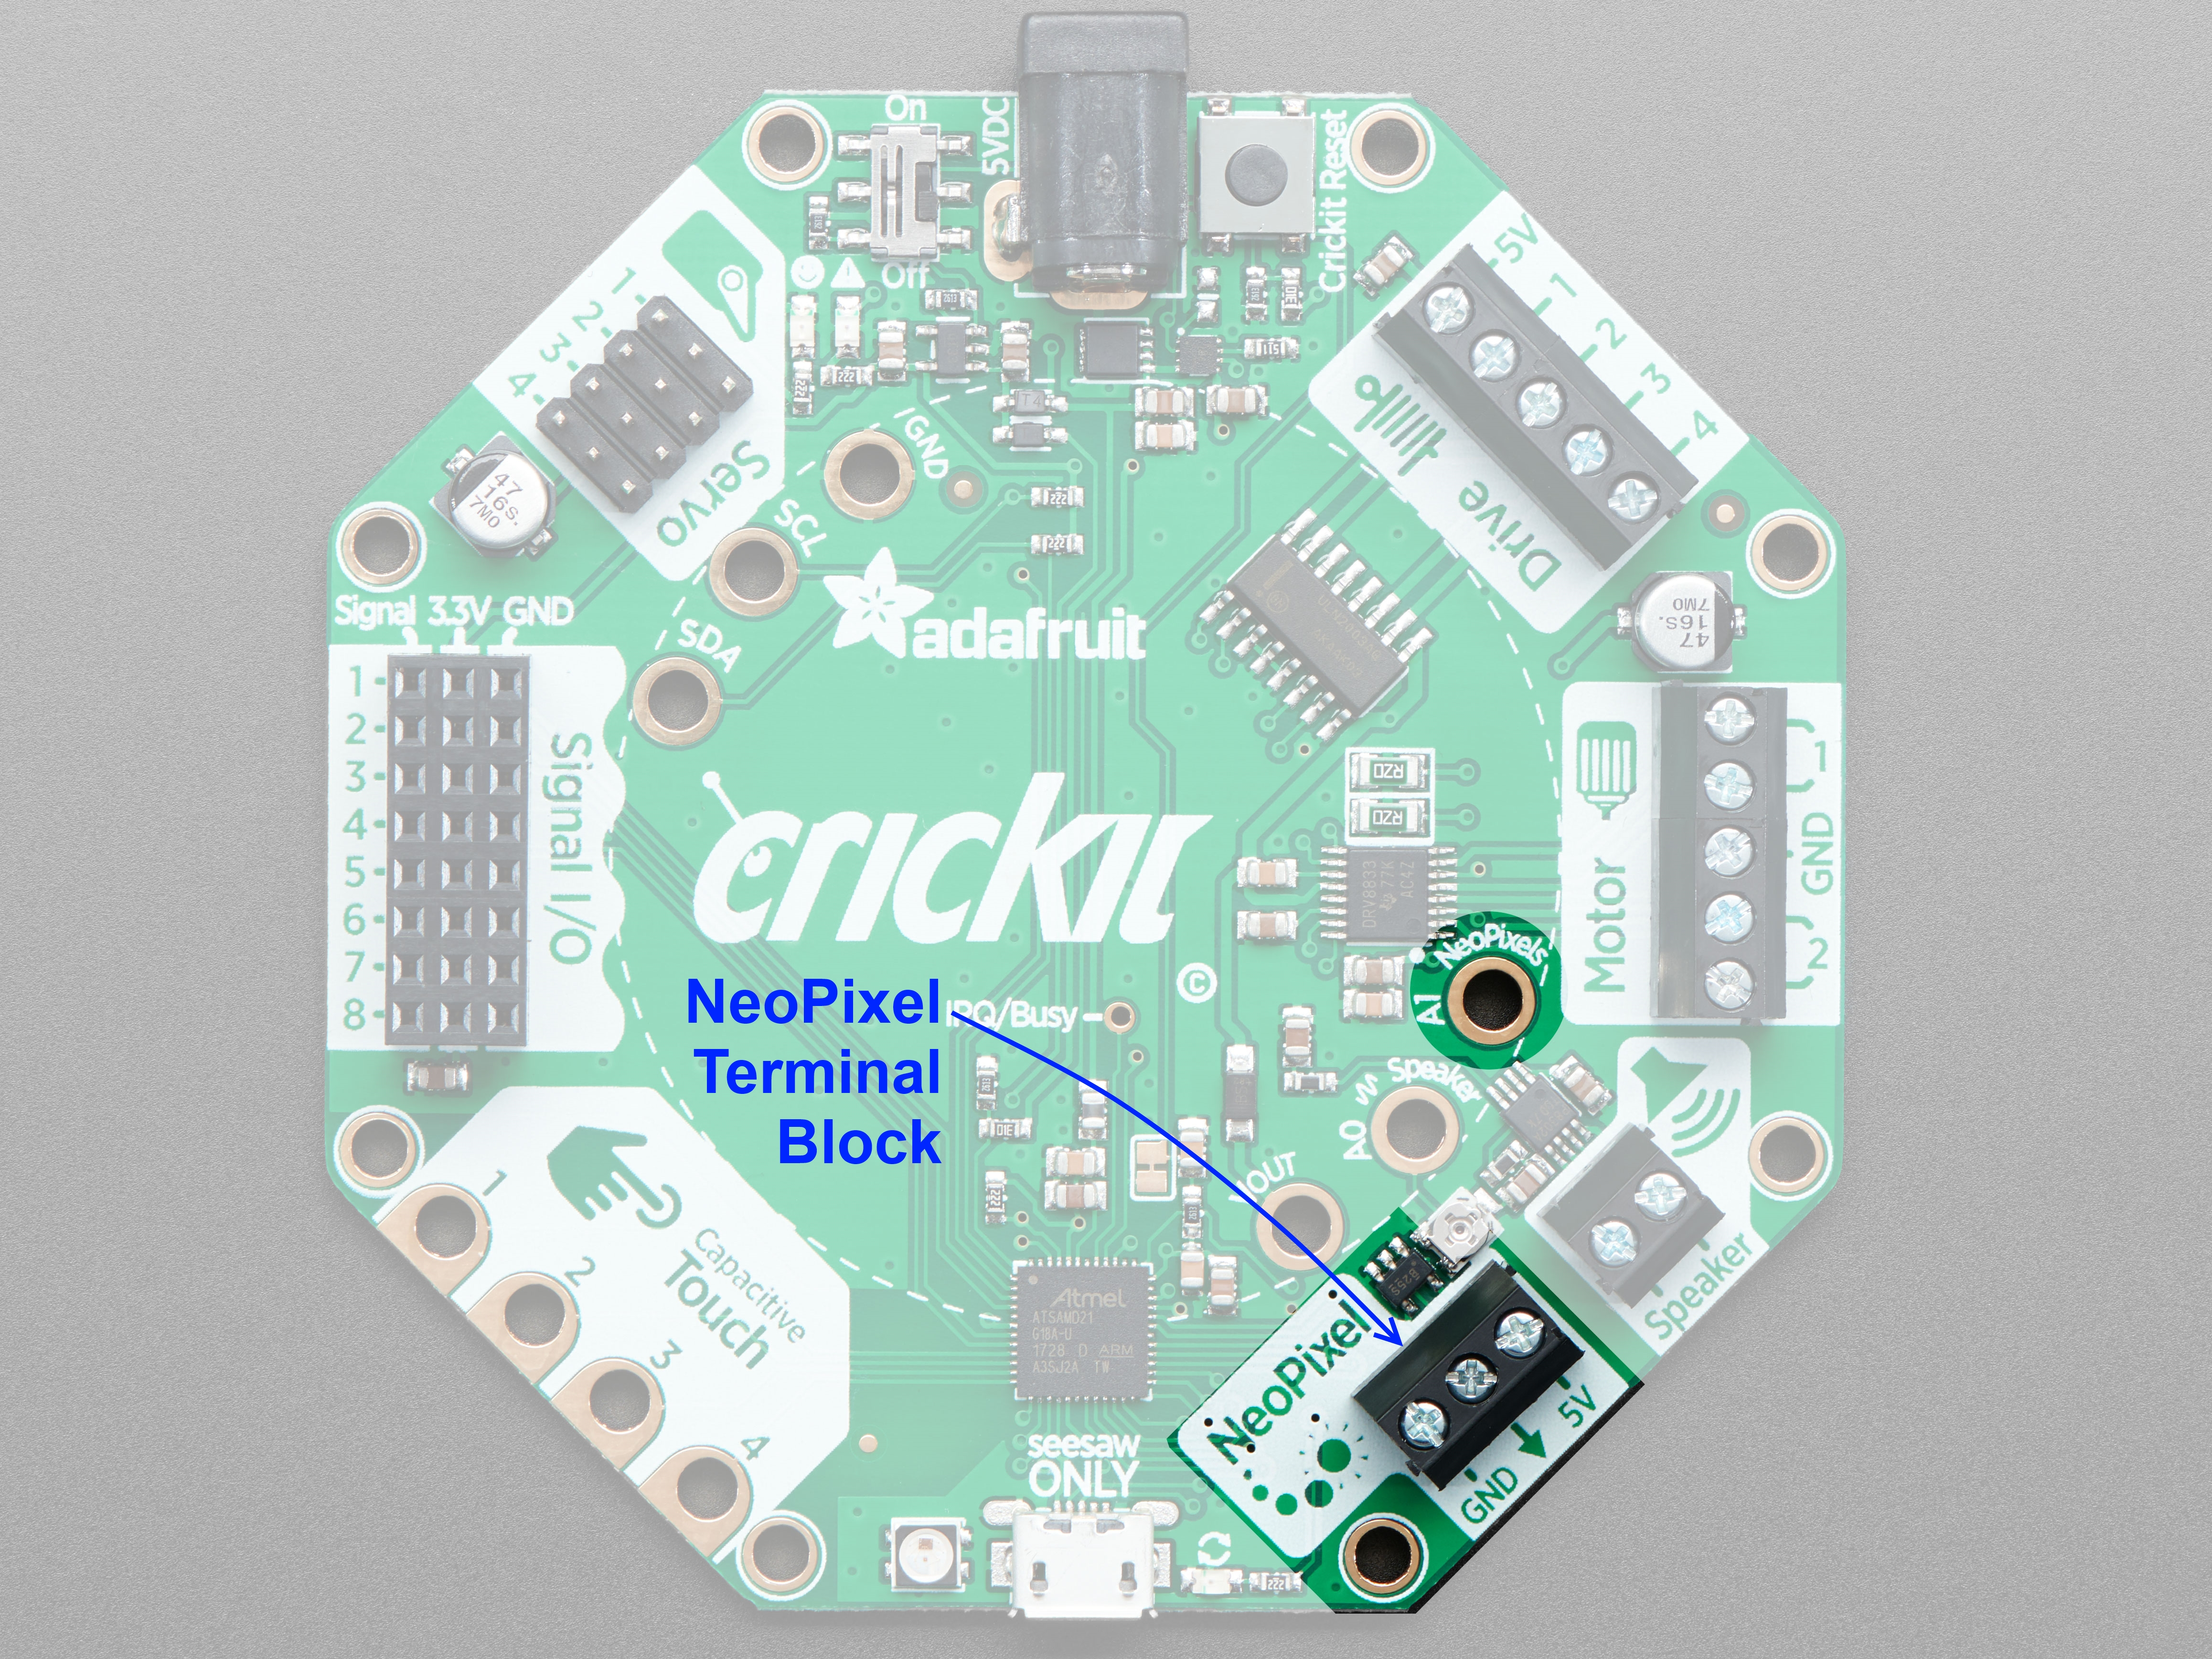 leds_circuit_playground_neopix.jpg